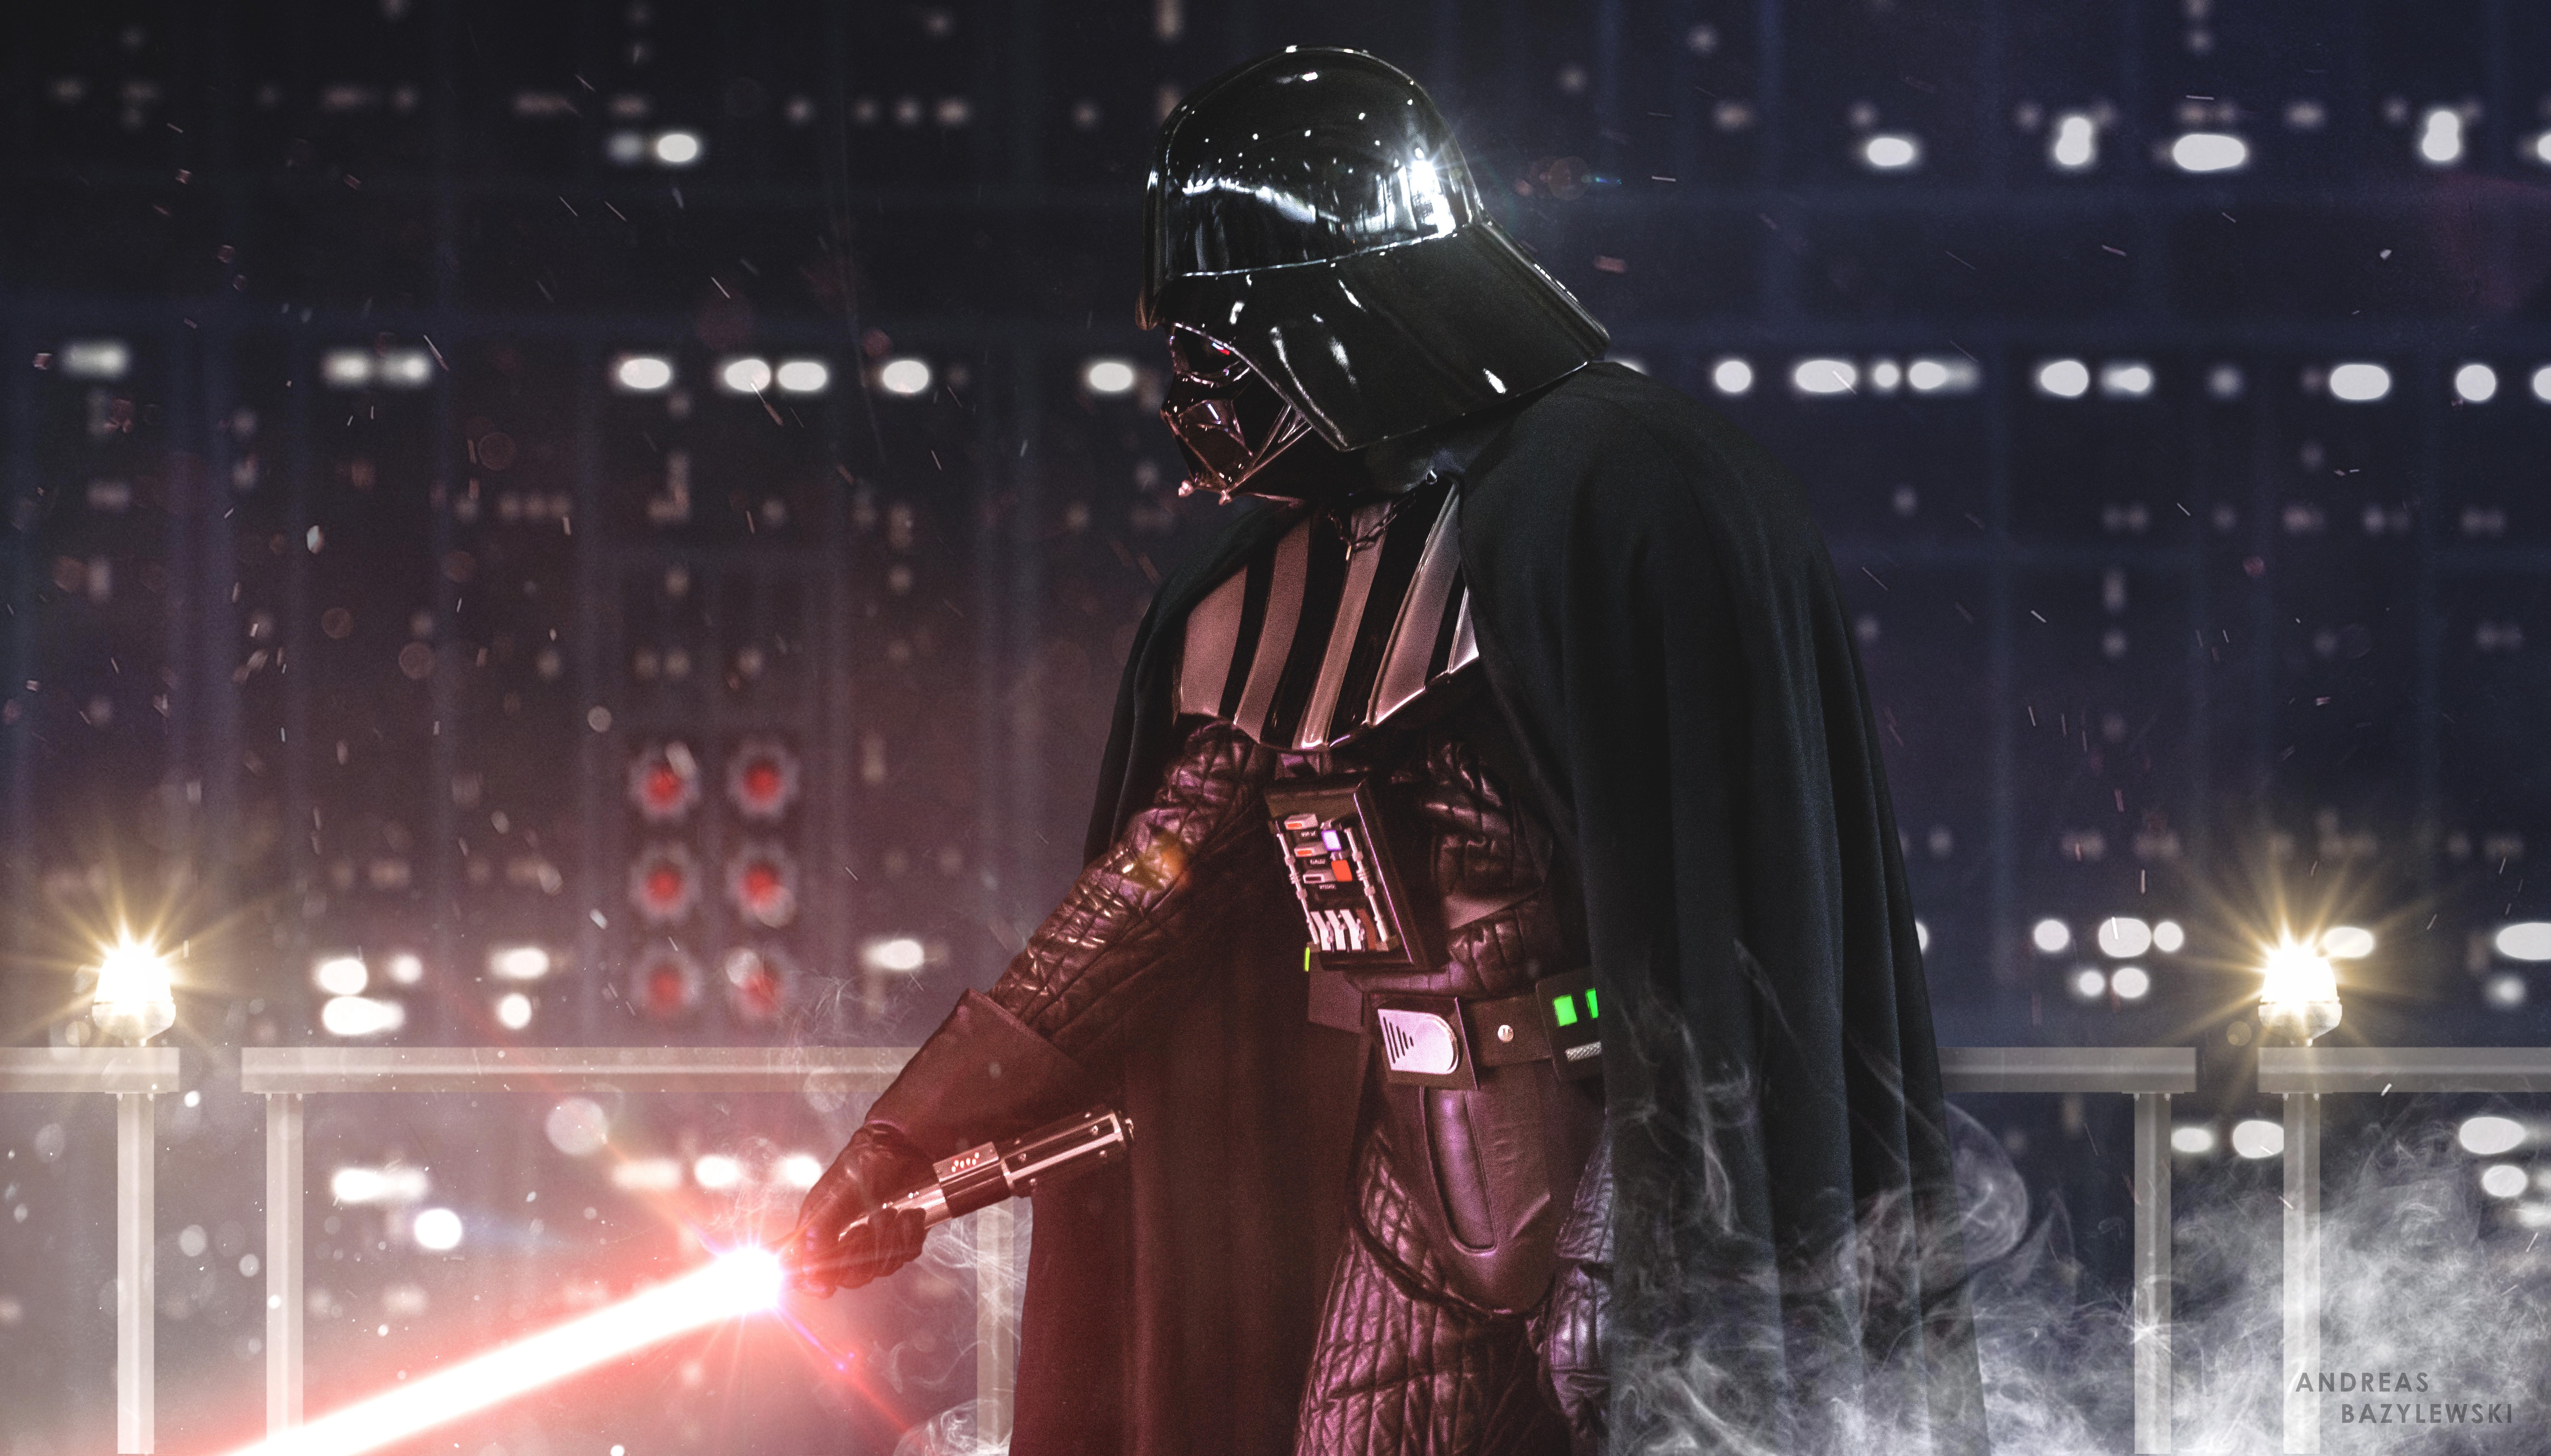 Star Wars Darth Vader Wallpaper 10617x6061 Download Hd Wallpaper Wallpapertip